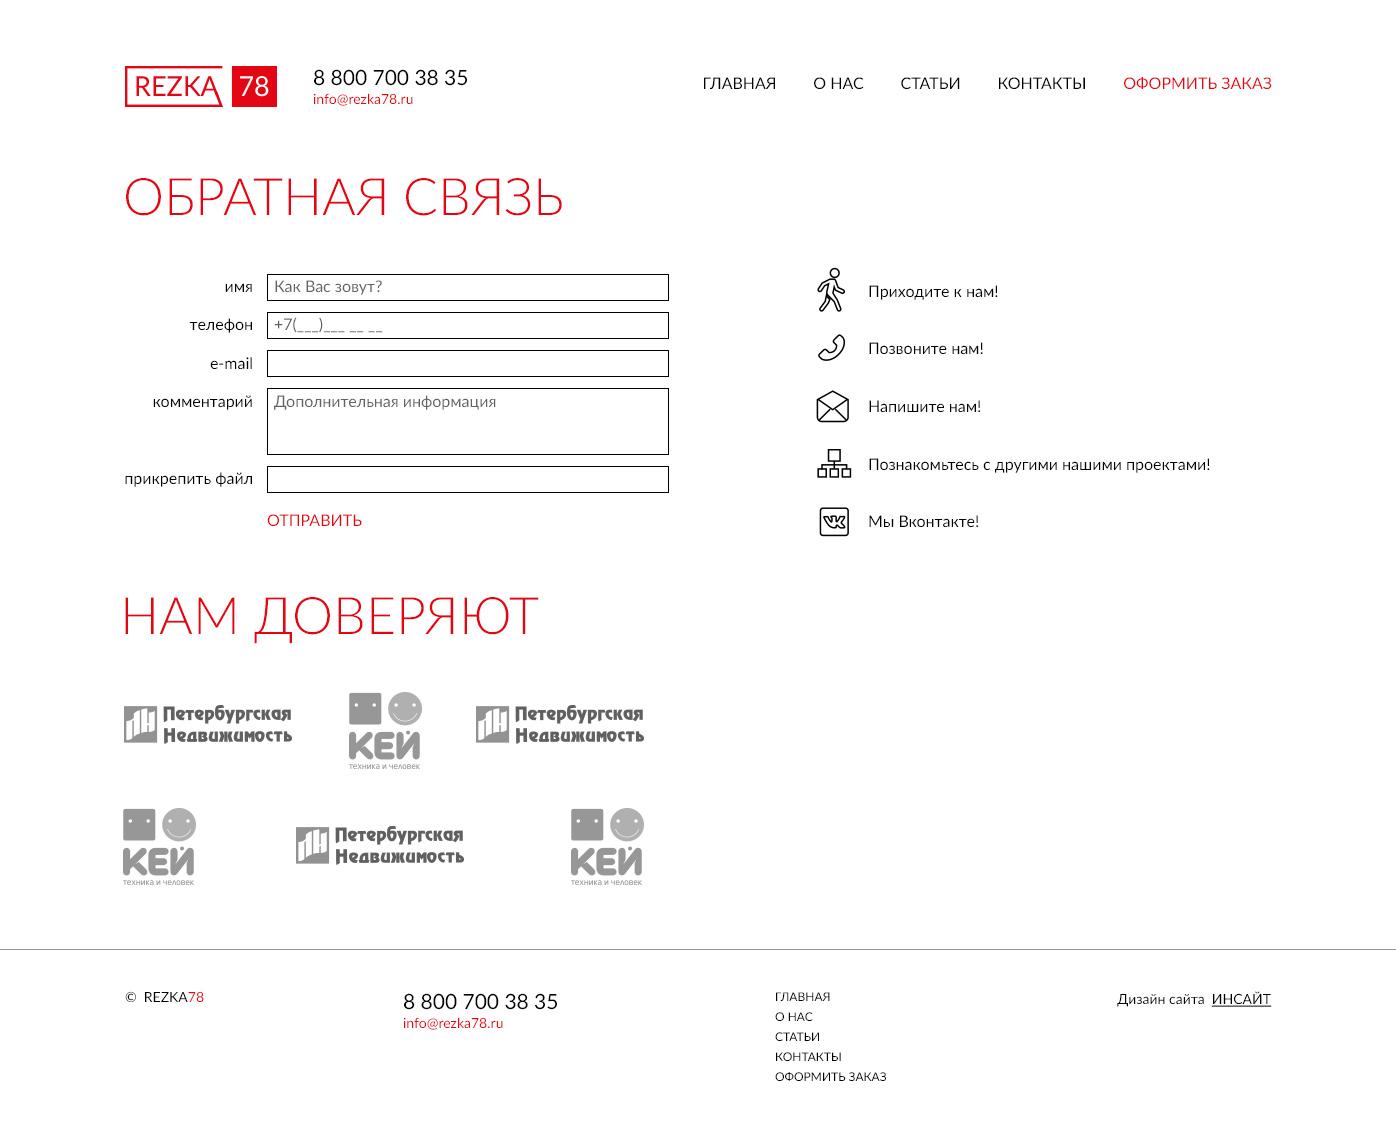 dizajn, prilagodljiv, web stranica, rezanje, 3D modeli, drvo, REZKA78.RU